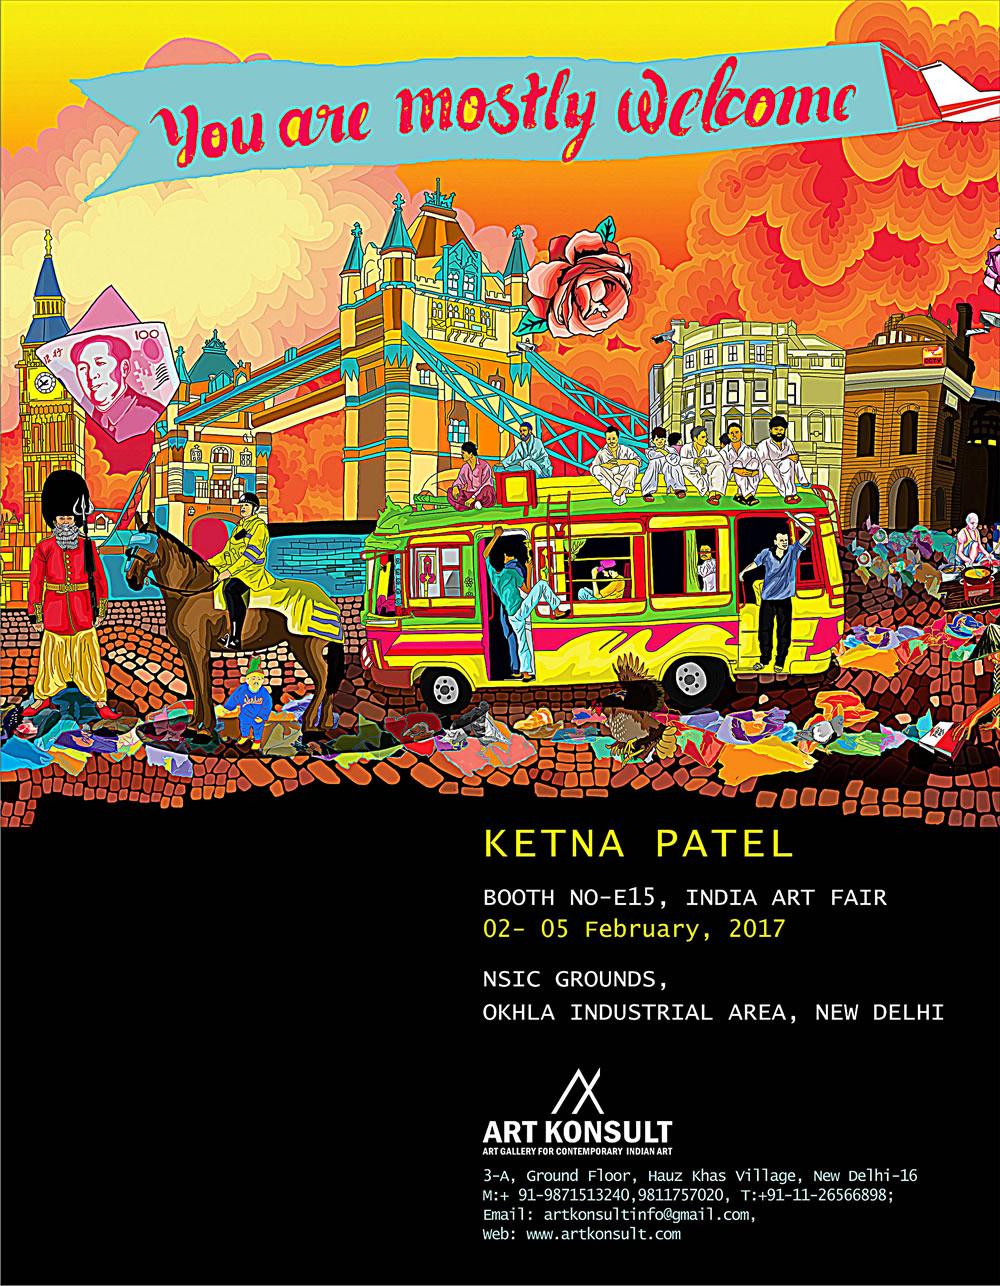 http://artkonsult.com/new/wp-content/uploads/2015/12/Ketna-Patel-IAF.jpg